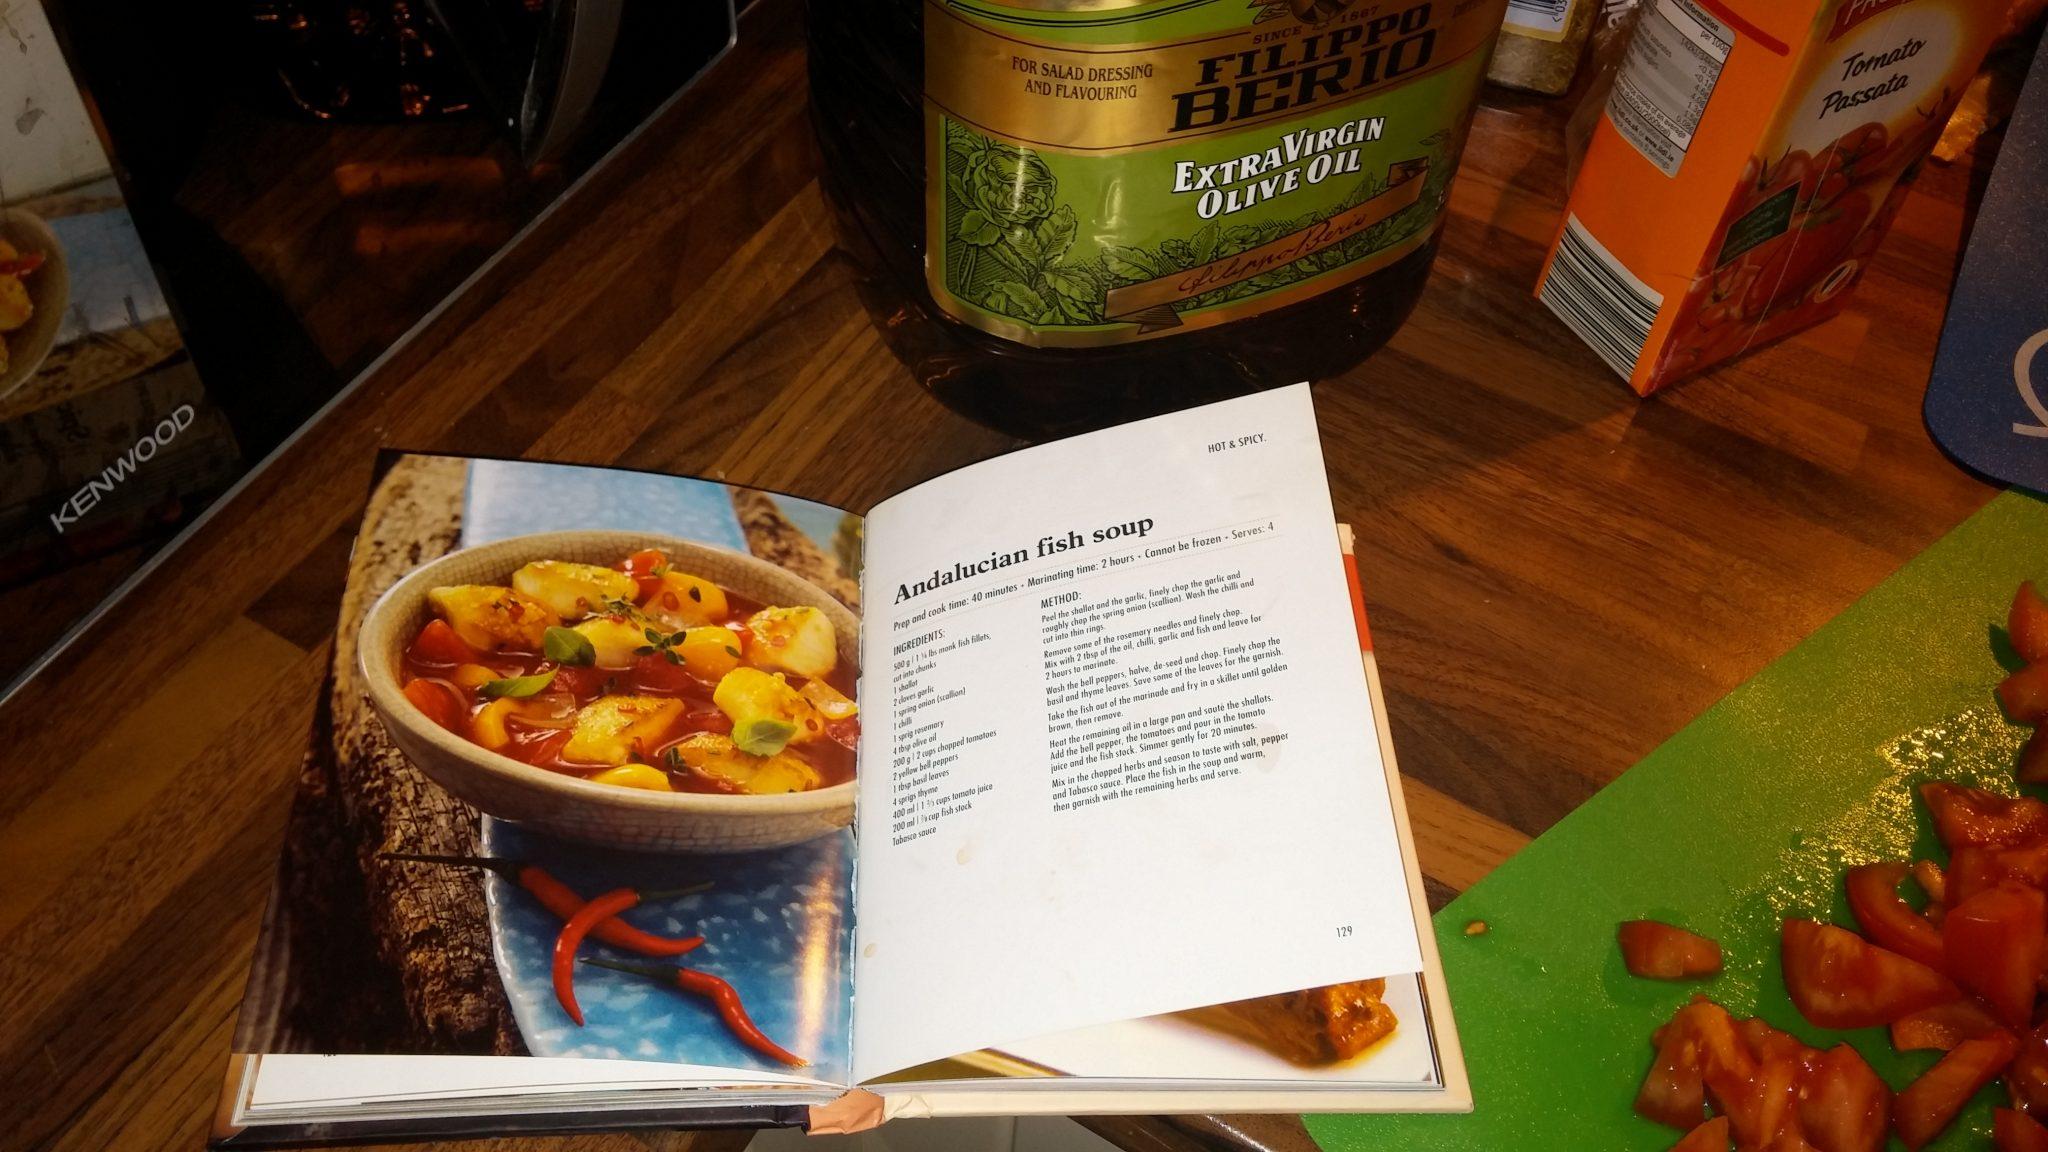 Test Kitchen: Andalucian fish stew (yum yum yum)!